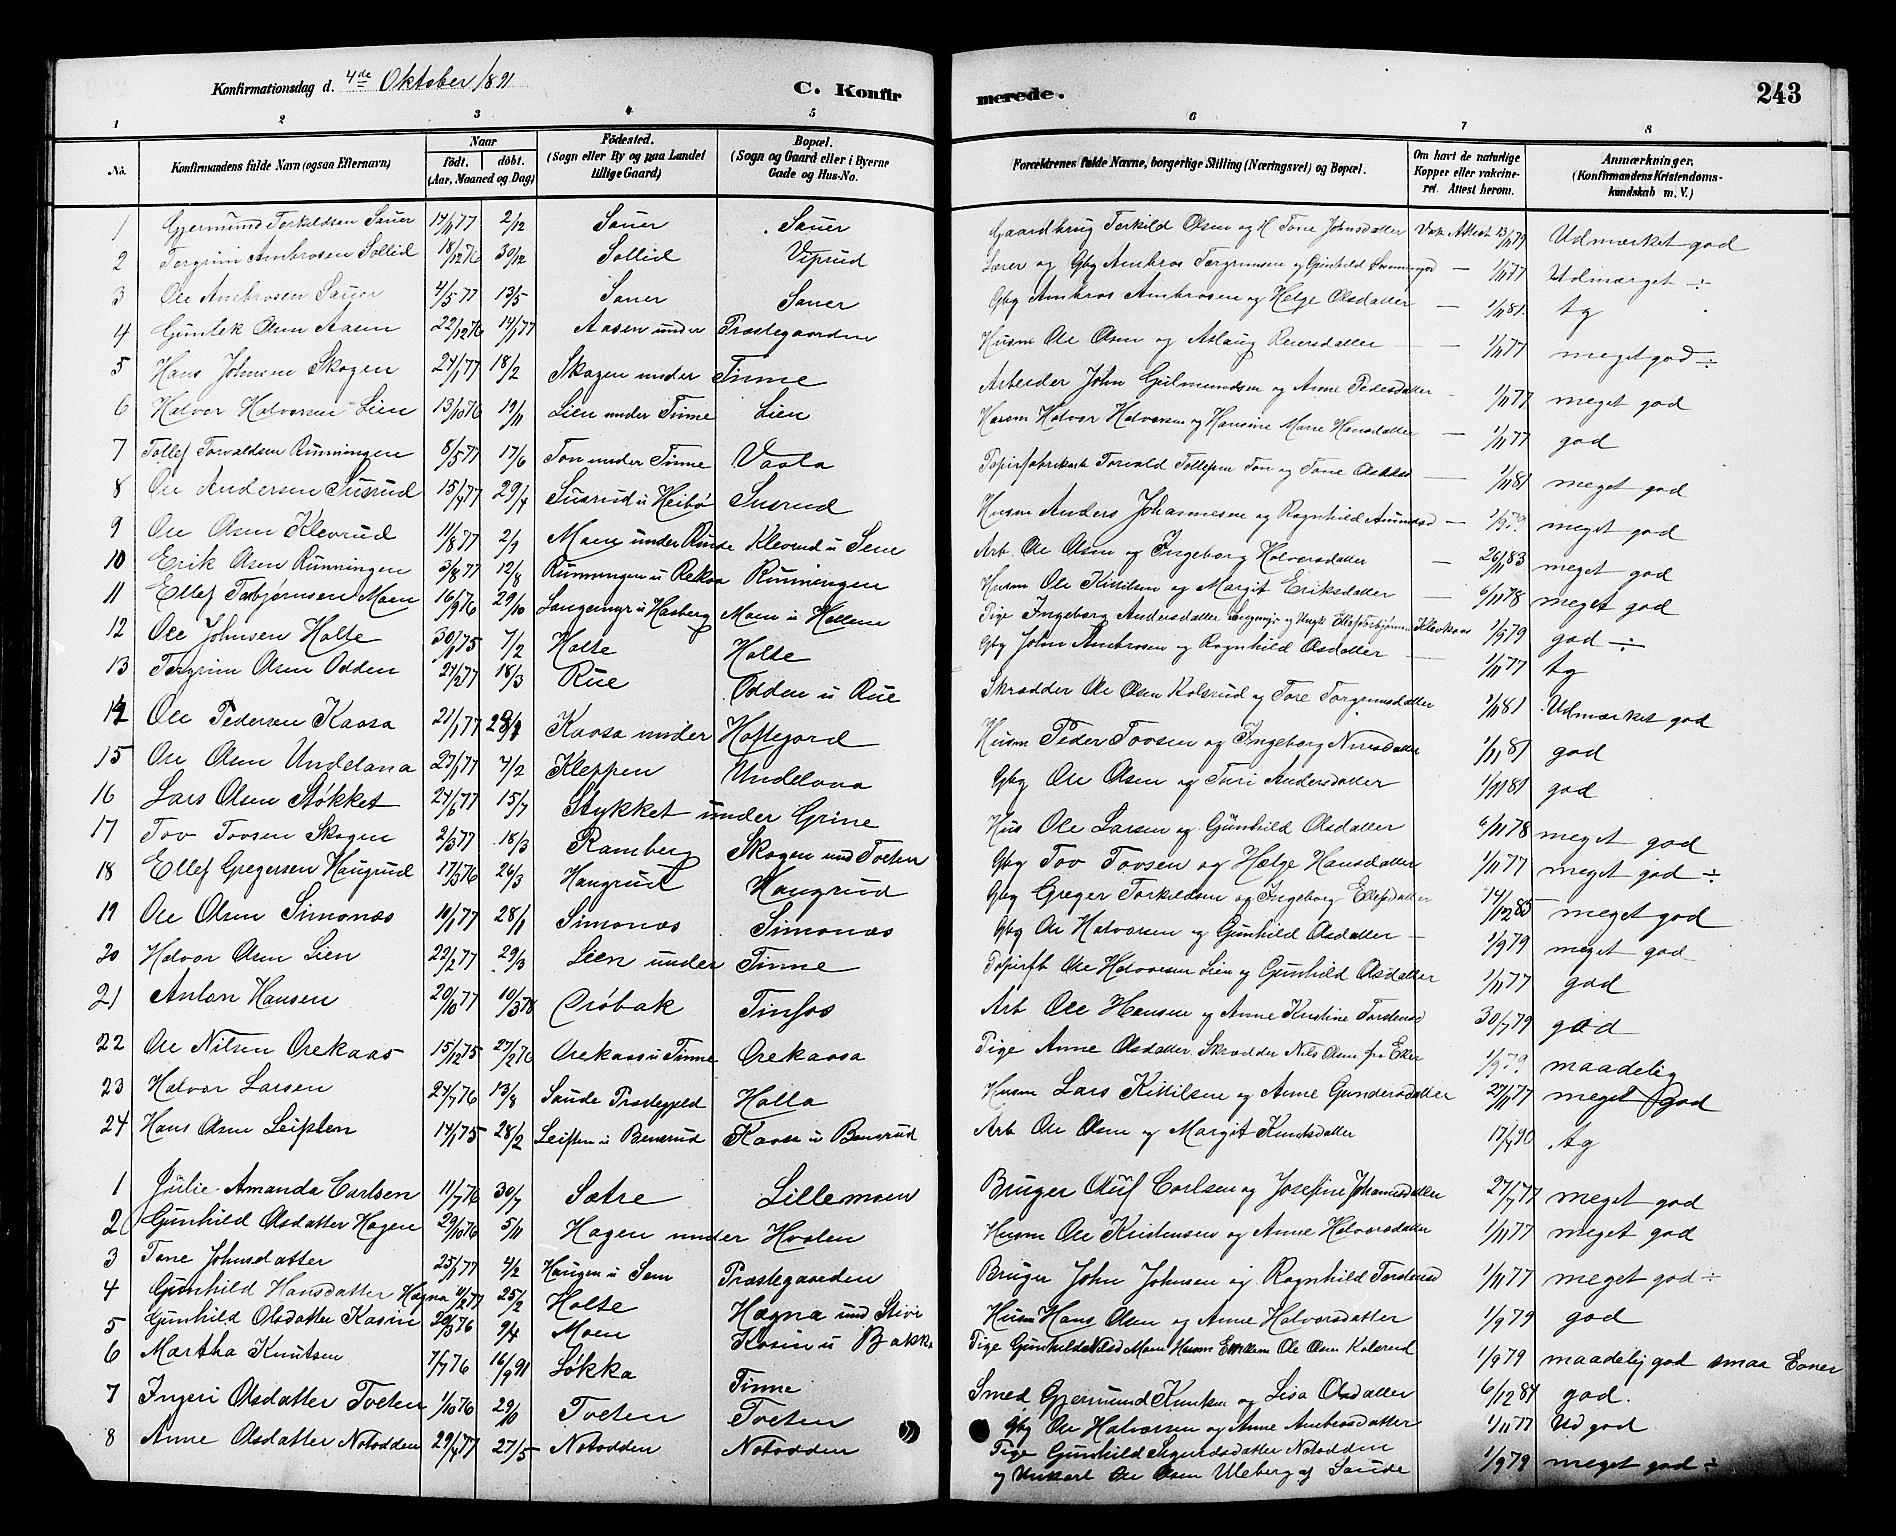 SAKO, Heddal kirkebøker, G/Ga/L0002: Klokkerbok nr. I 2, 1879-1908, s. 243